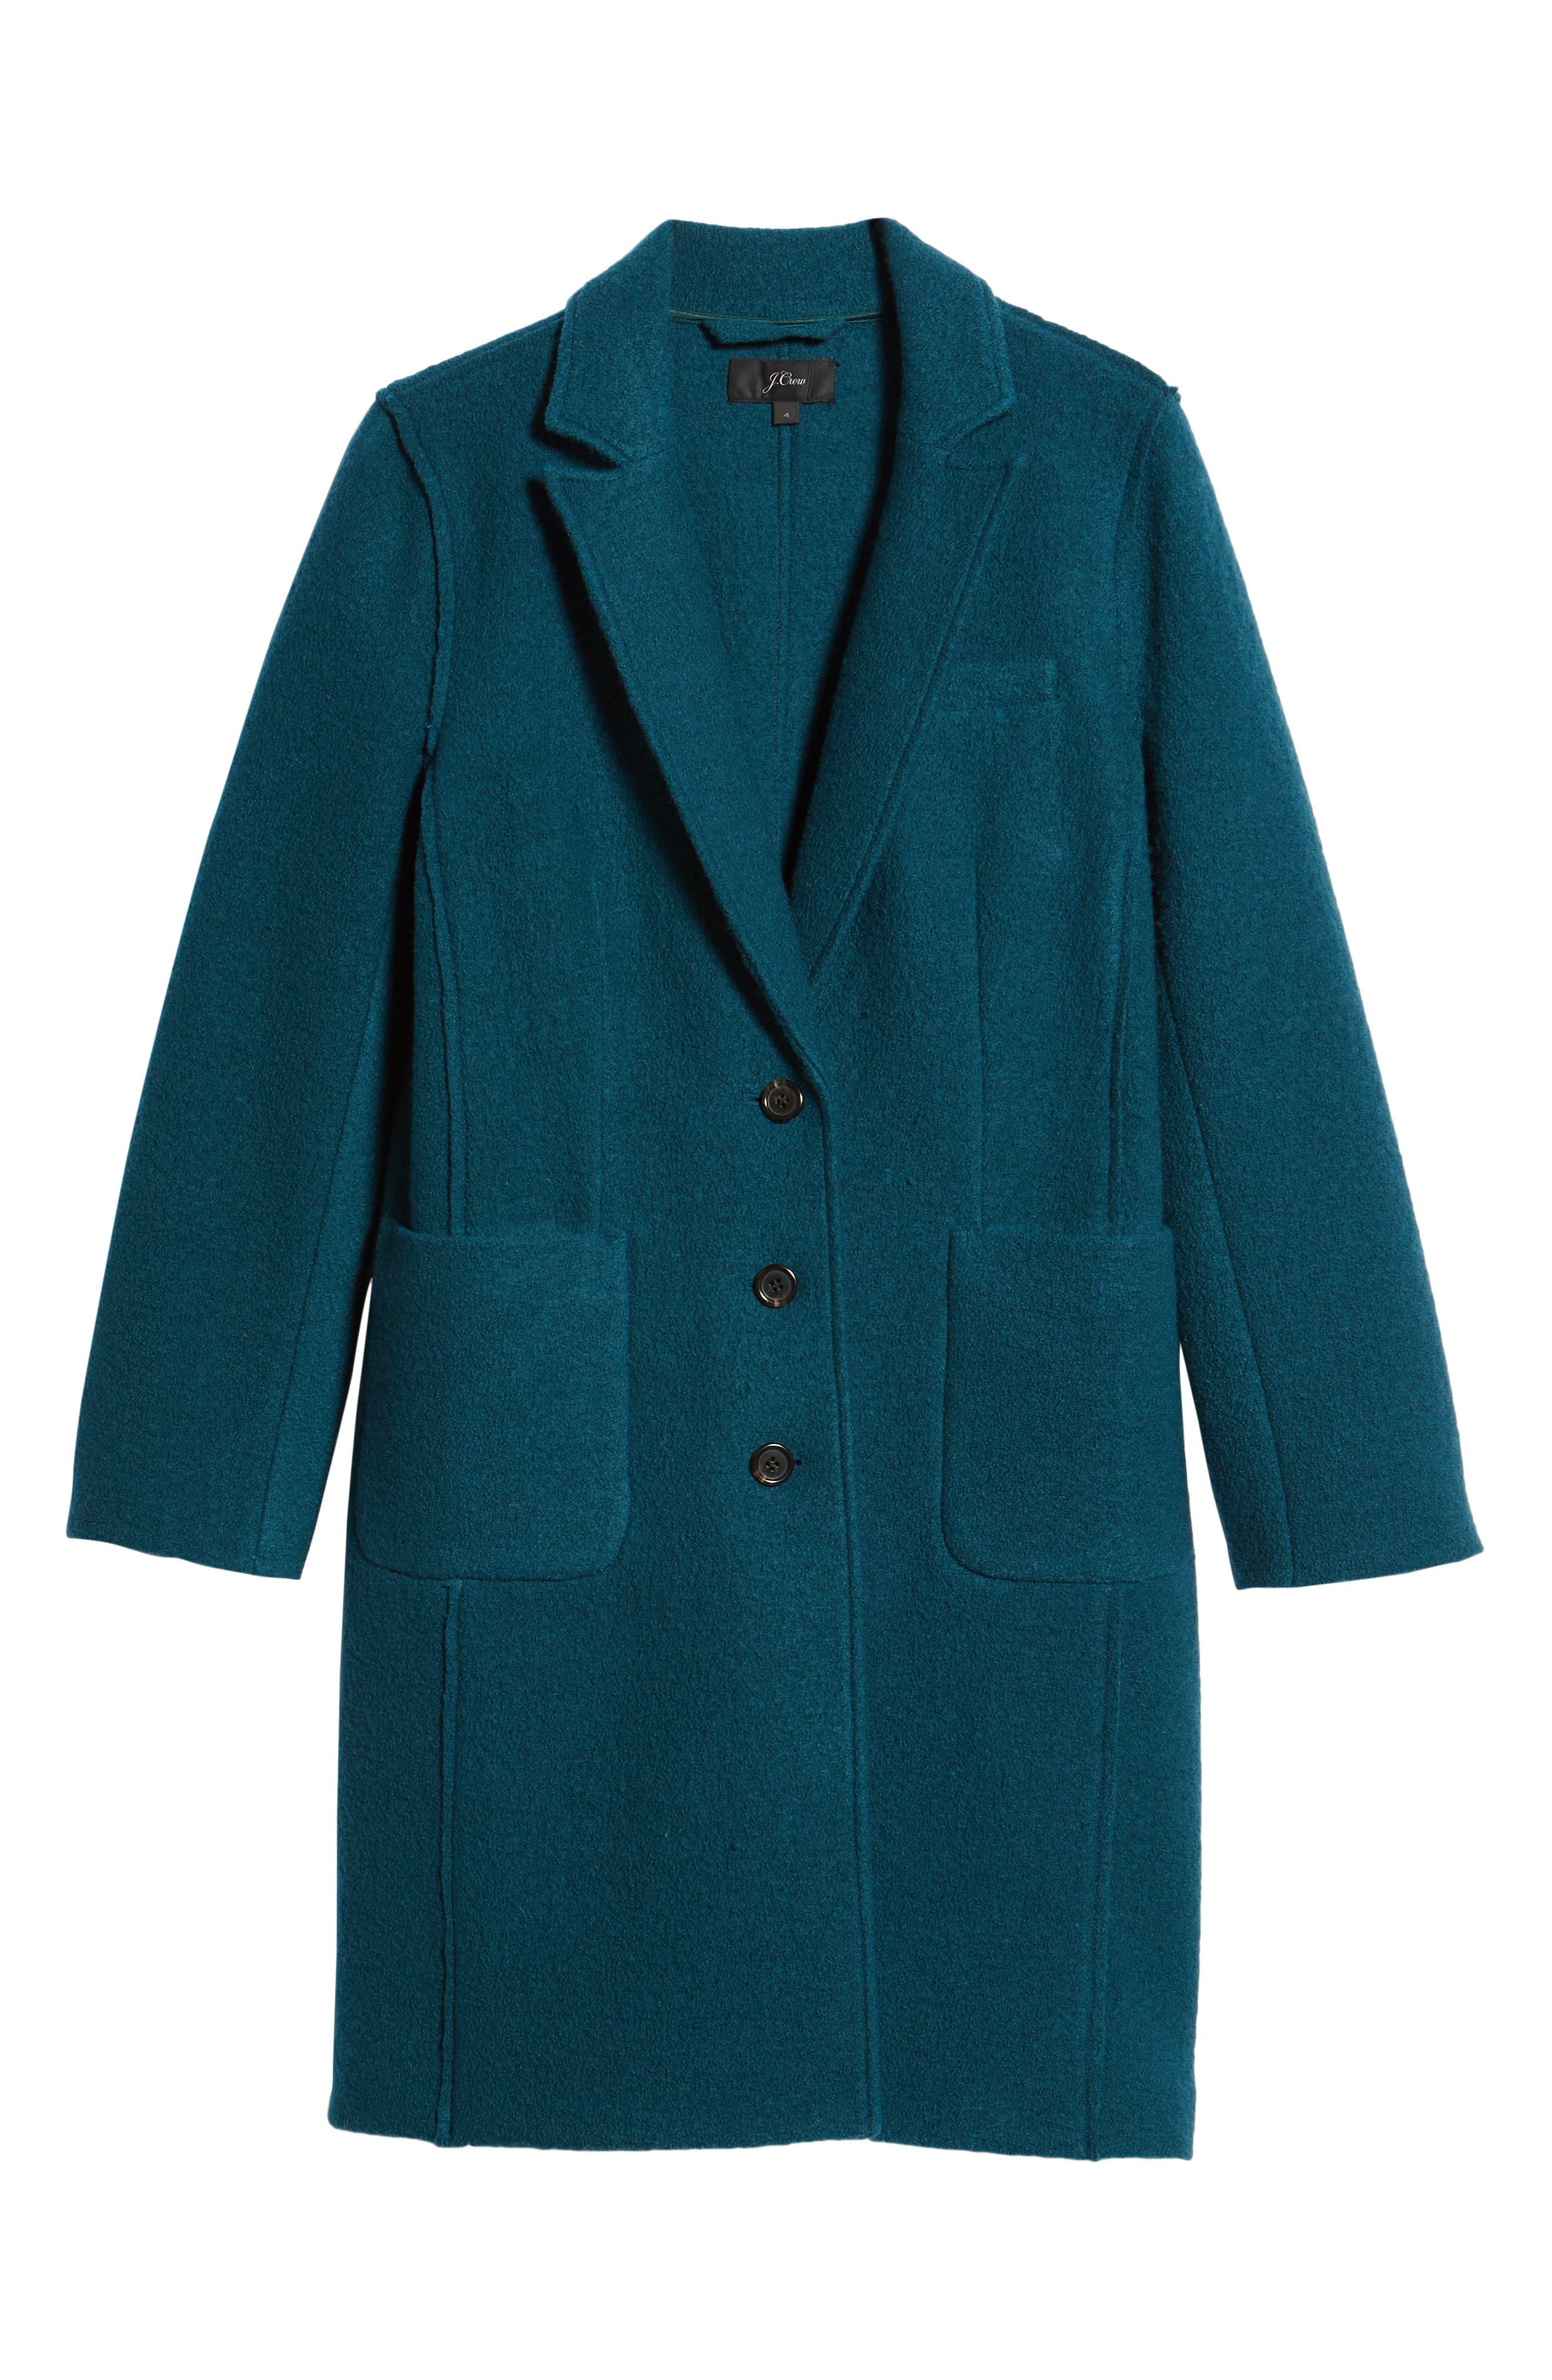 Olga Boiled Wool Topcoat,                             Alternate thumbnail 7, color,                             Winter Pine